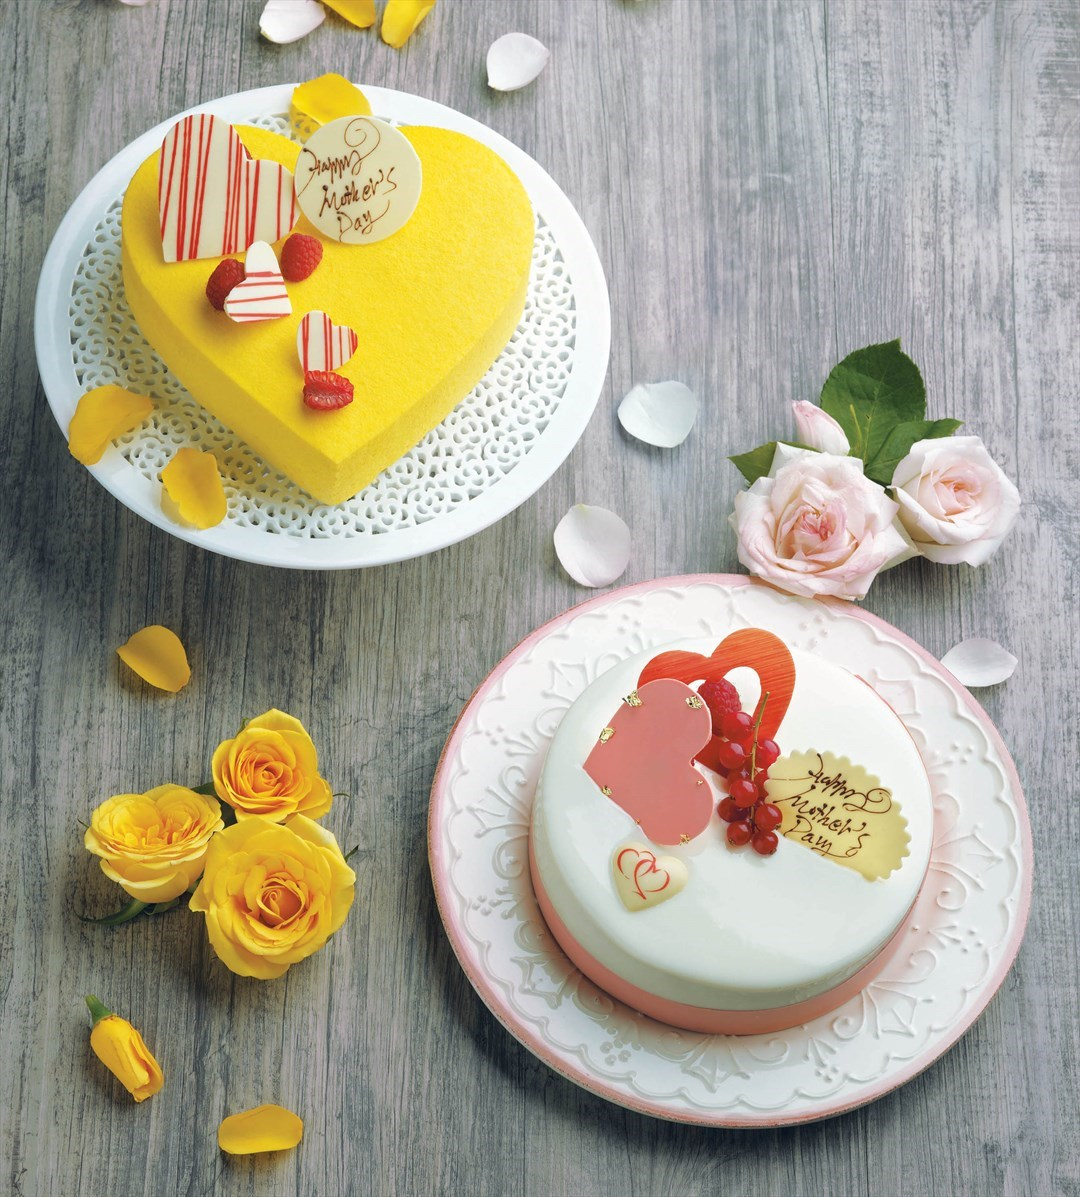 Bakerzin Mother's Day Cakes 2014